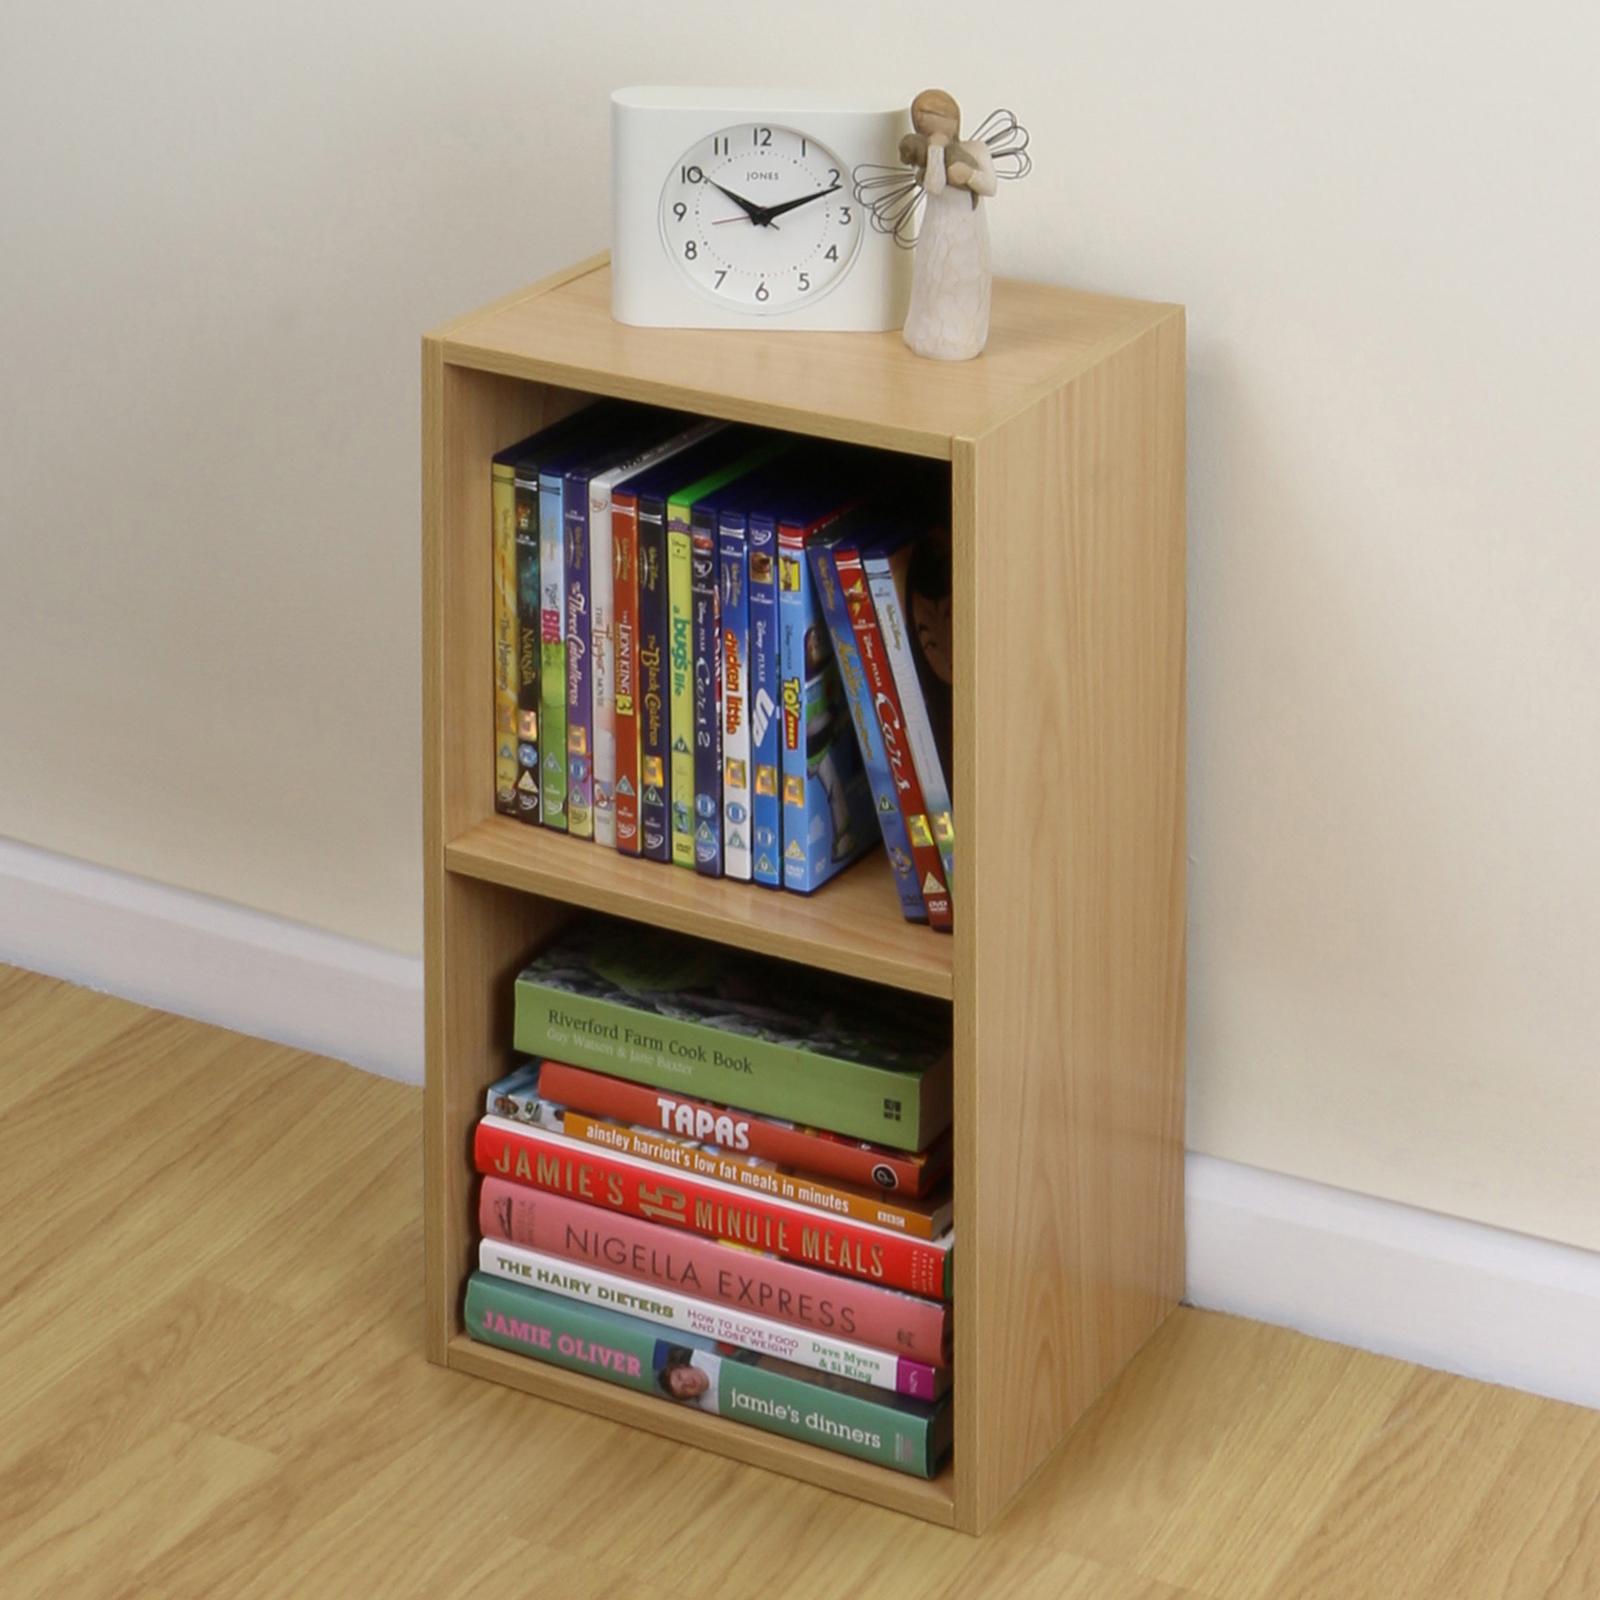 new concept 4450d 697d3 2 Tier Wooden Beech Cube Bookcase Storage Unit Shelving ...